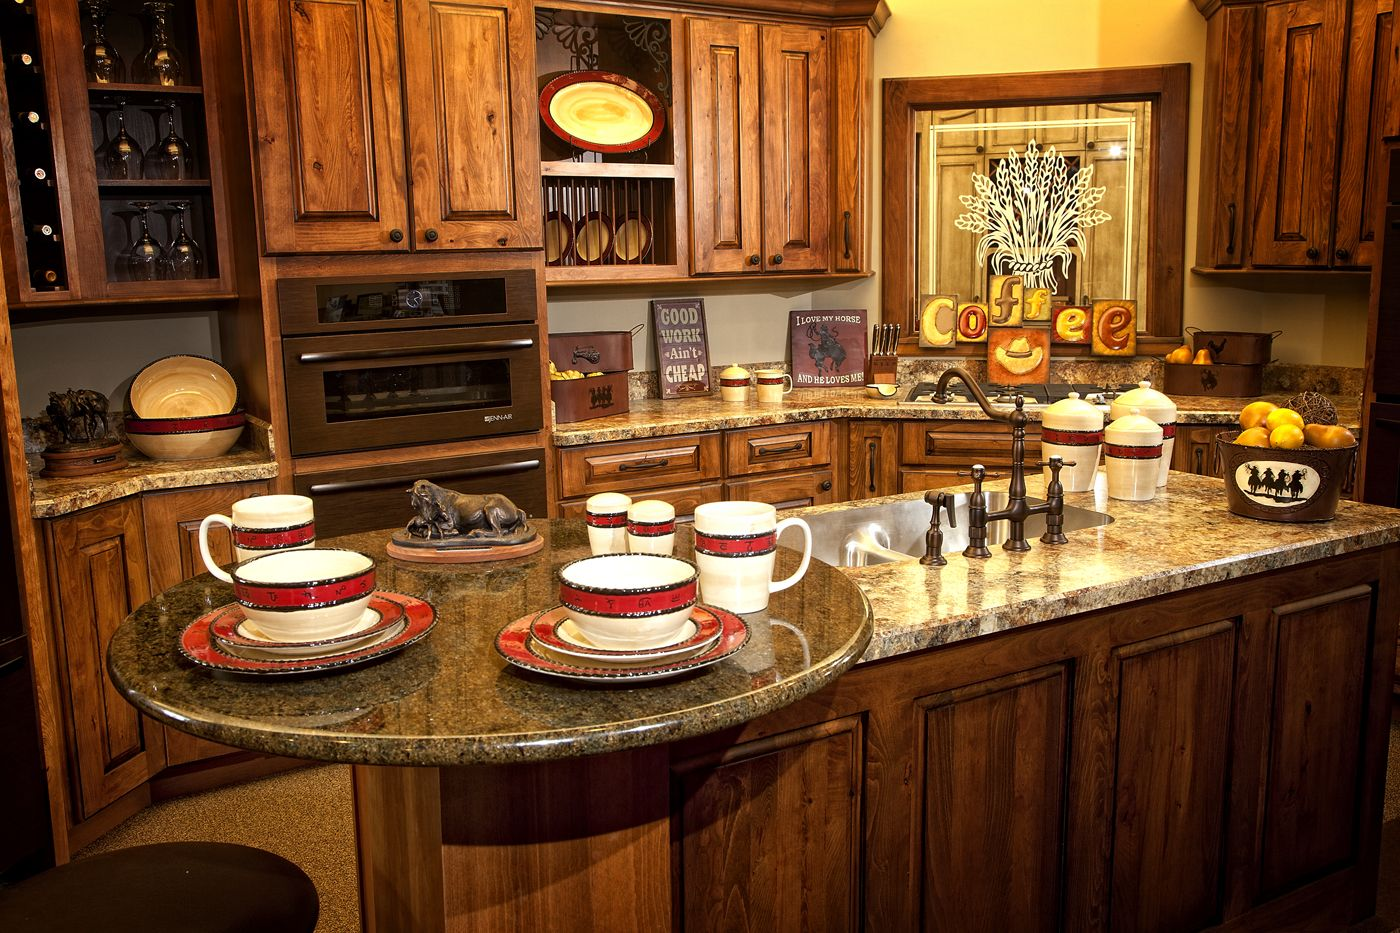 Beautiful western kitchen home ideas pinterest - Western kitchen ideas ...